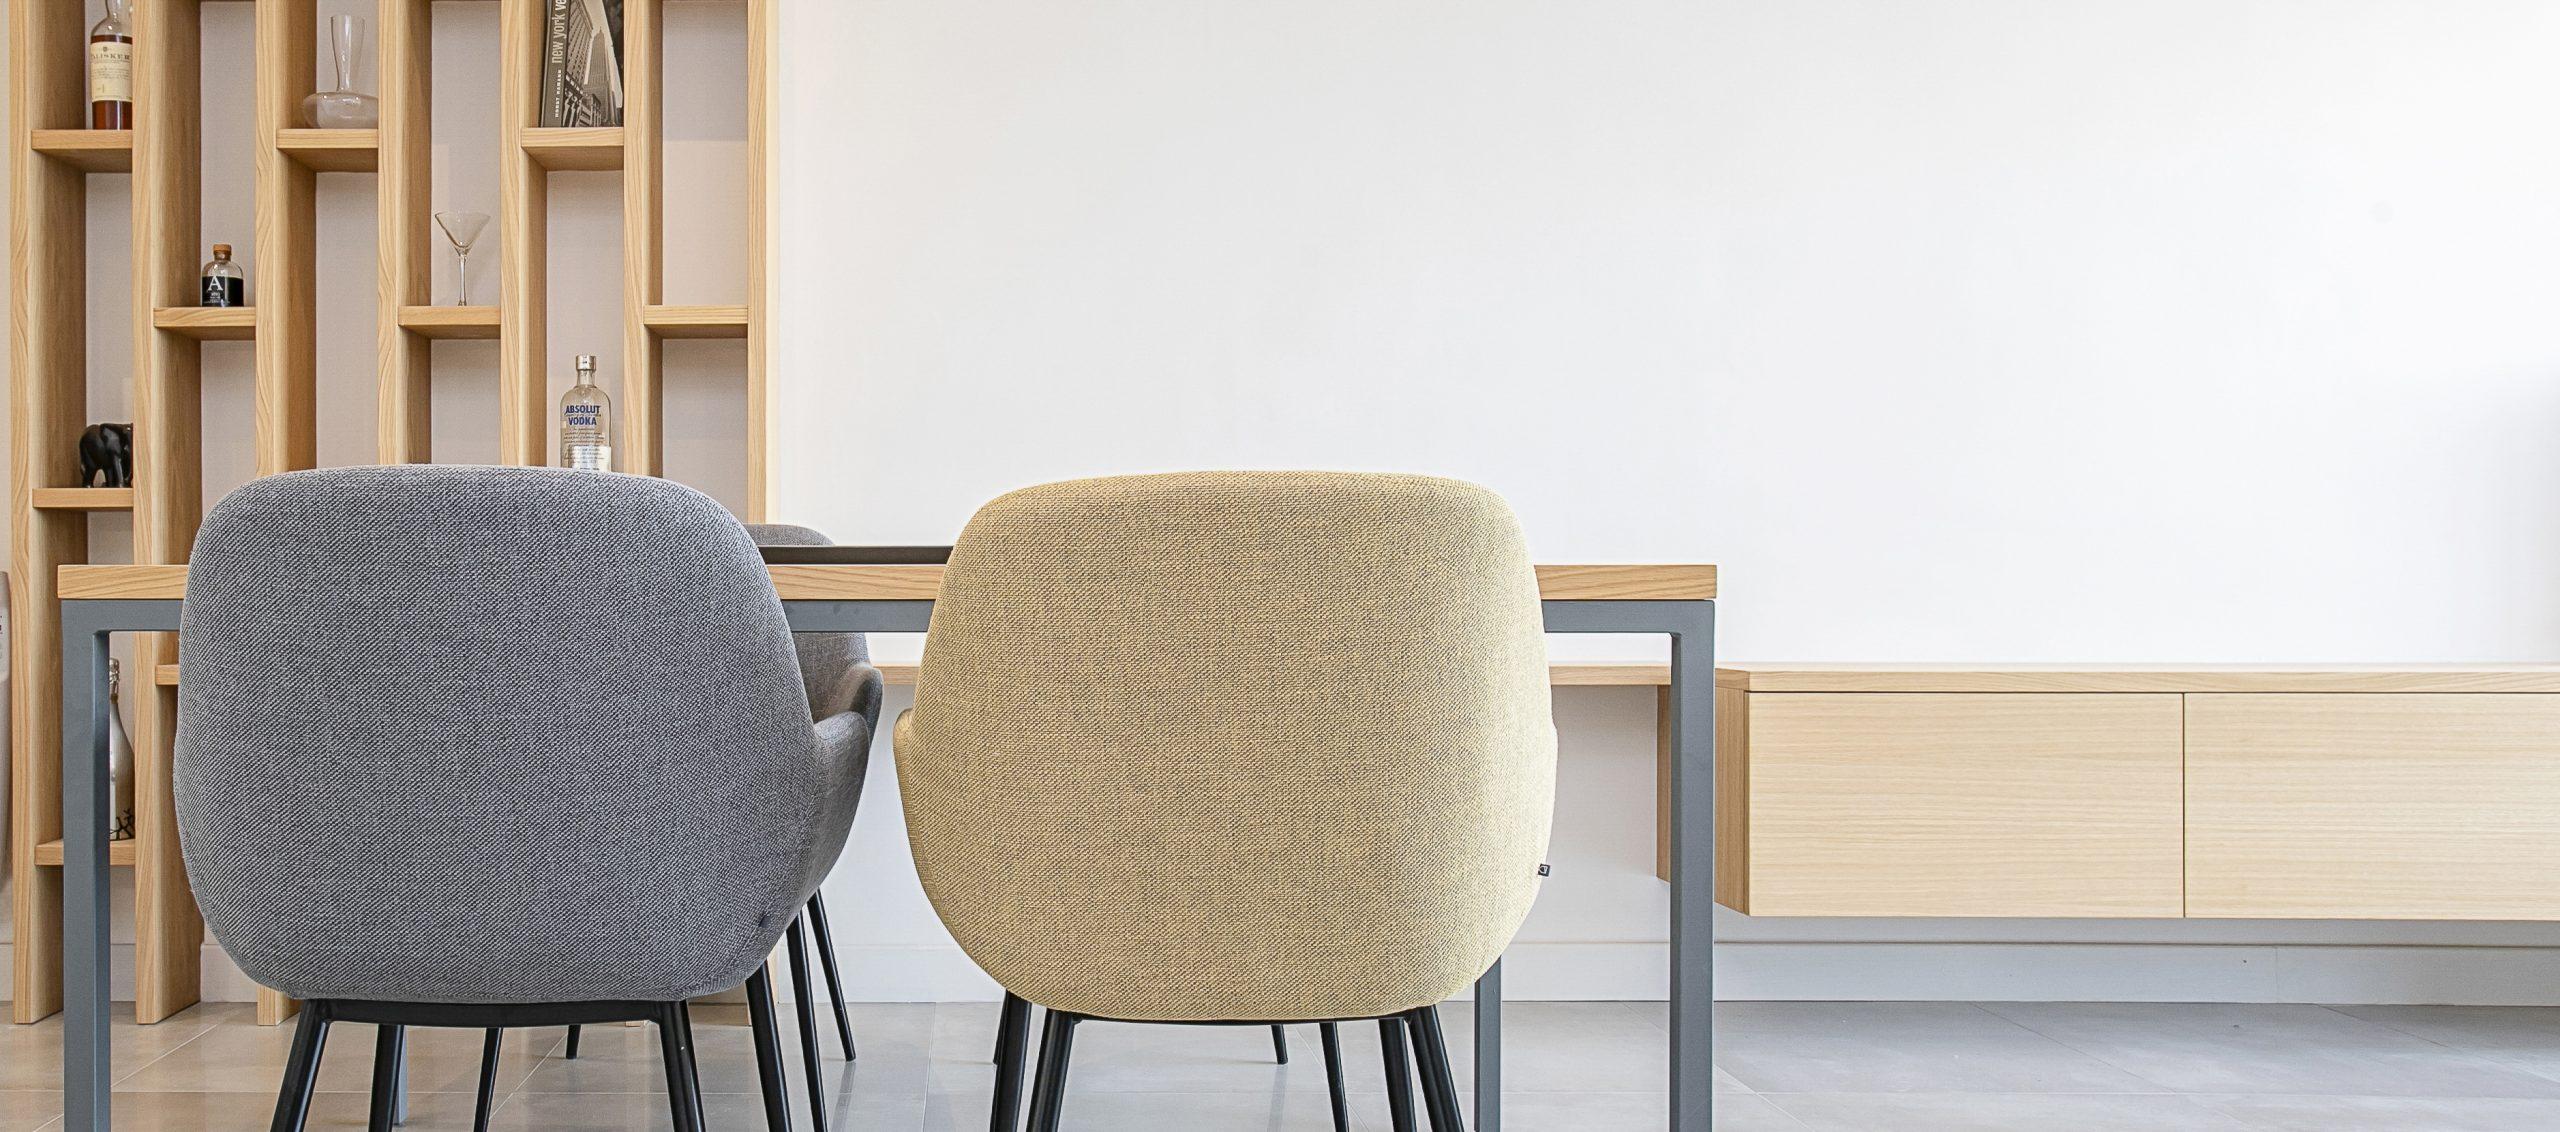 Interiorismo Reforma Ático Barcelona Silla Design